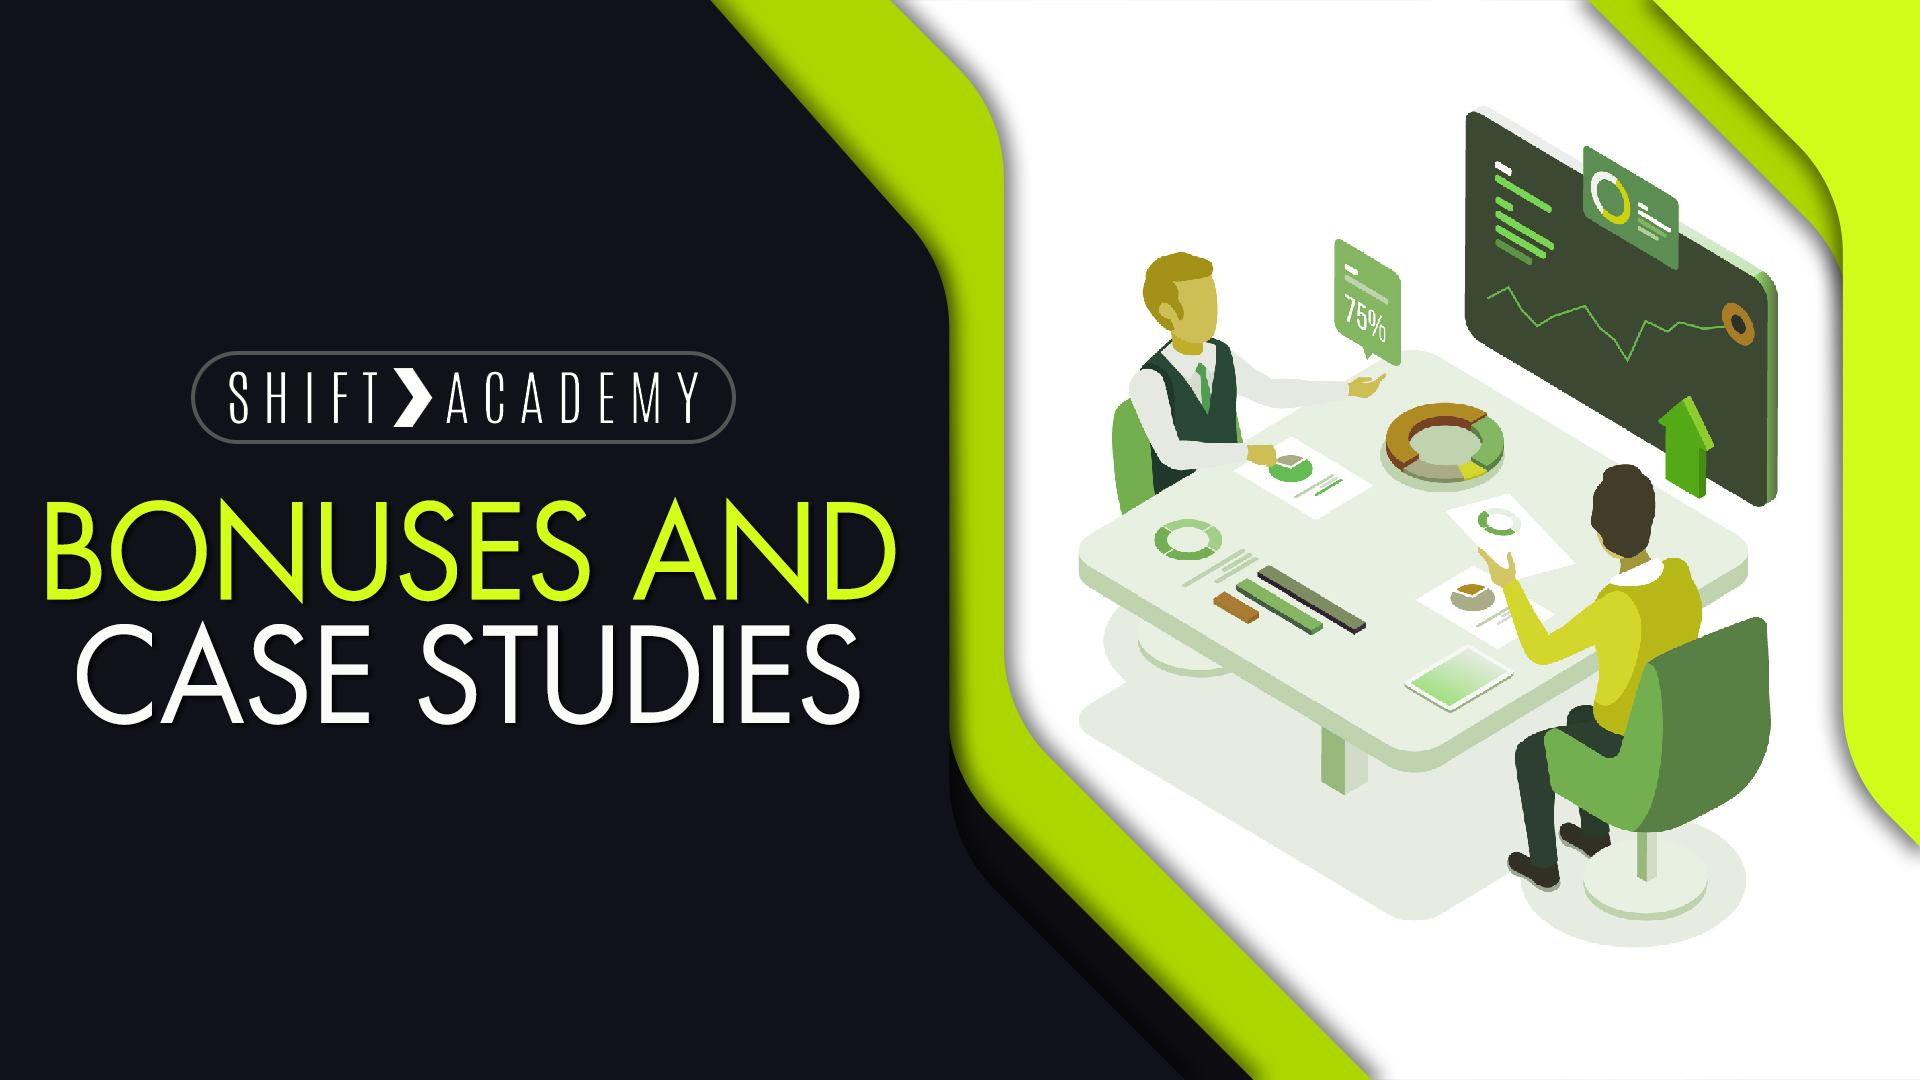 Bonuses and Case Studies